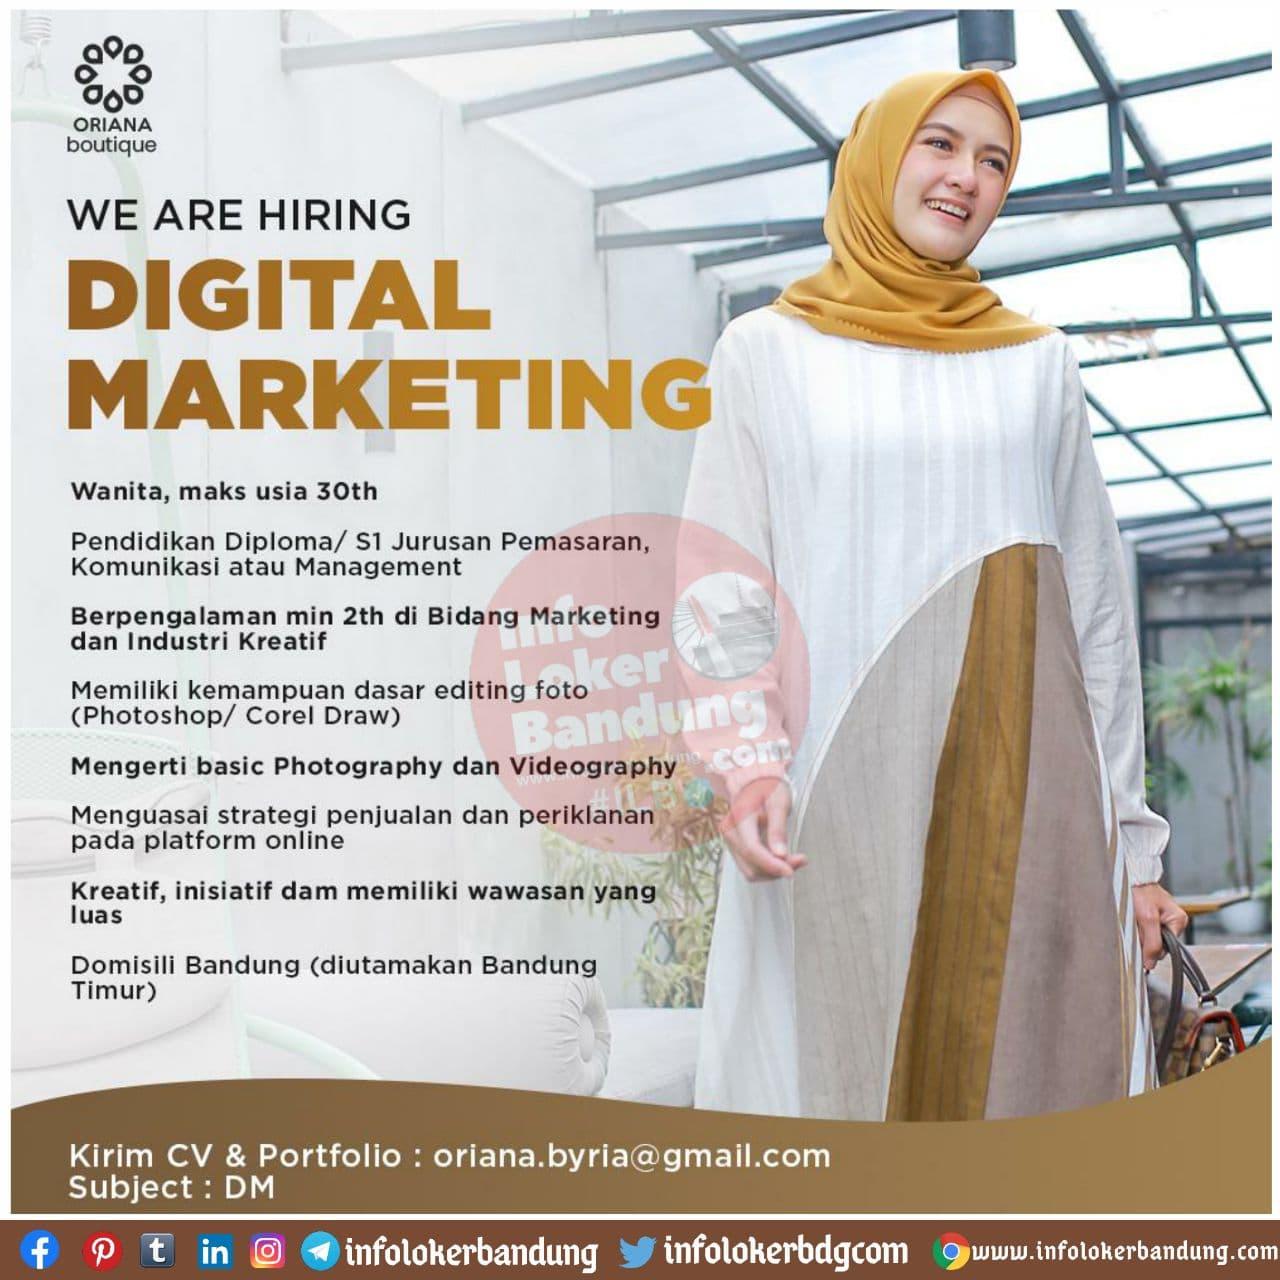 Lowongan Kerja Digital Marketing Oriana Boutique Bandung November 2020